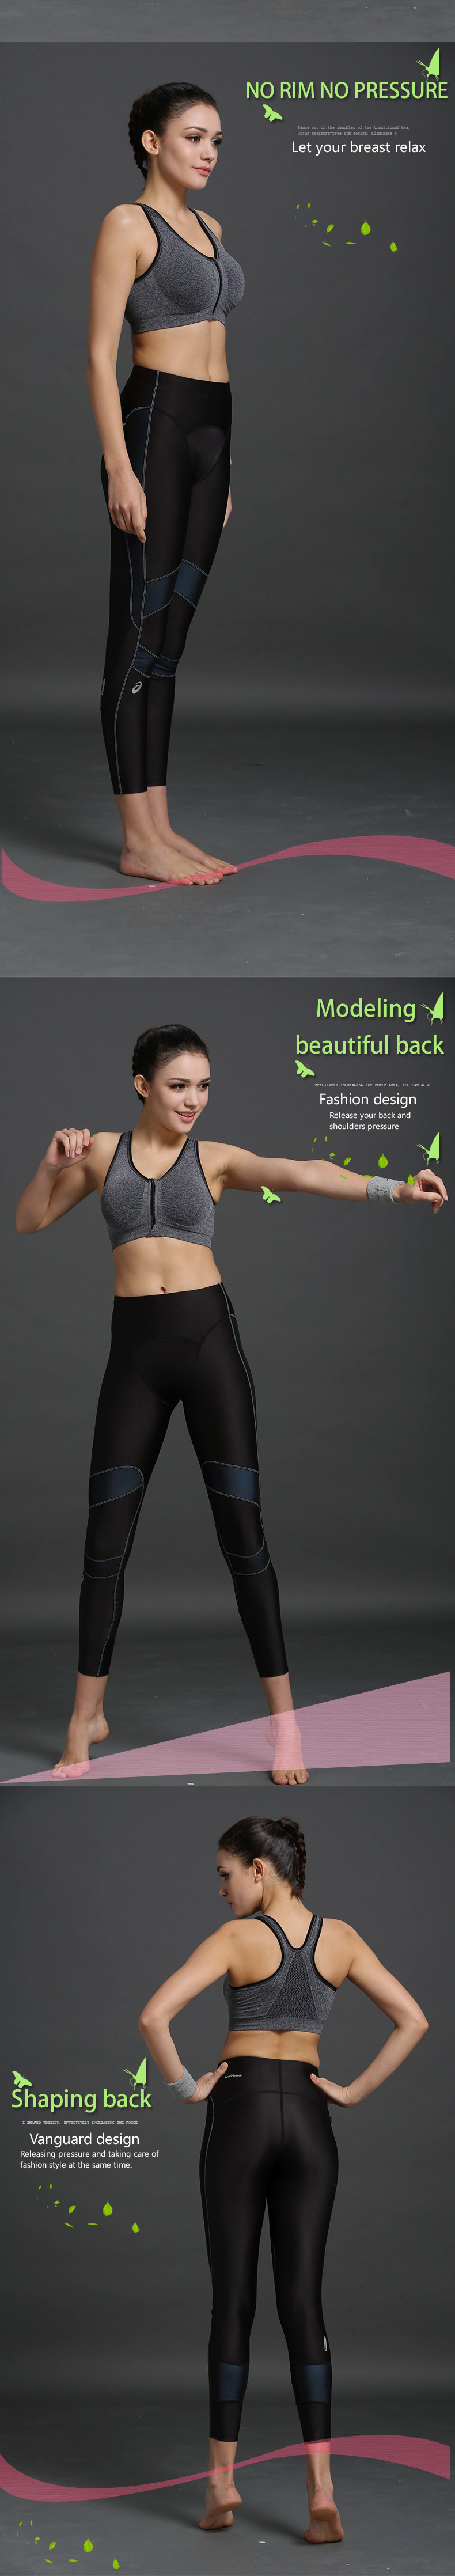 B.BANG 17 New Women Zipper Bra Push Up Crop Top Seamless Sexy Shakeproof Underwear M-XXXL Big Size Wholesale Brassiere 3